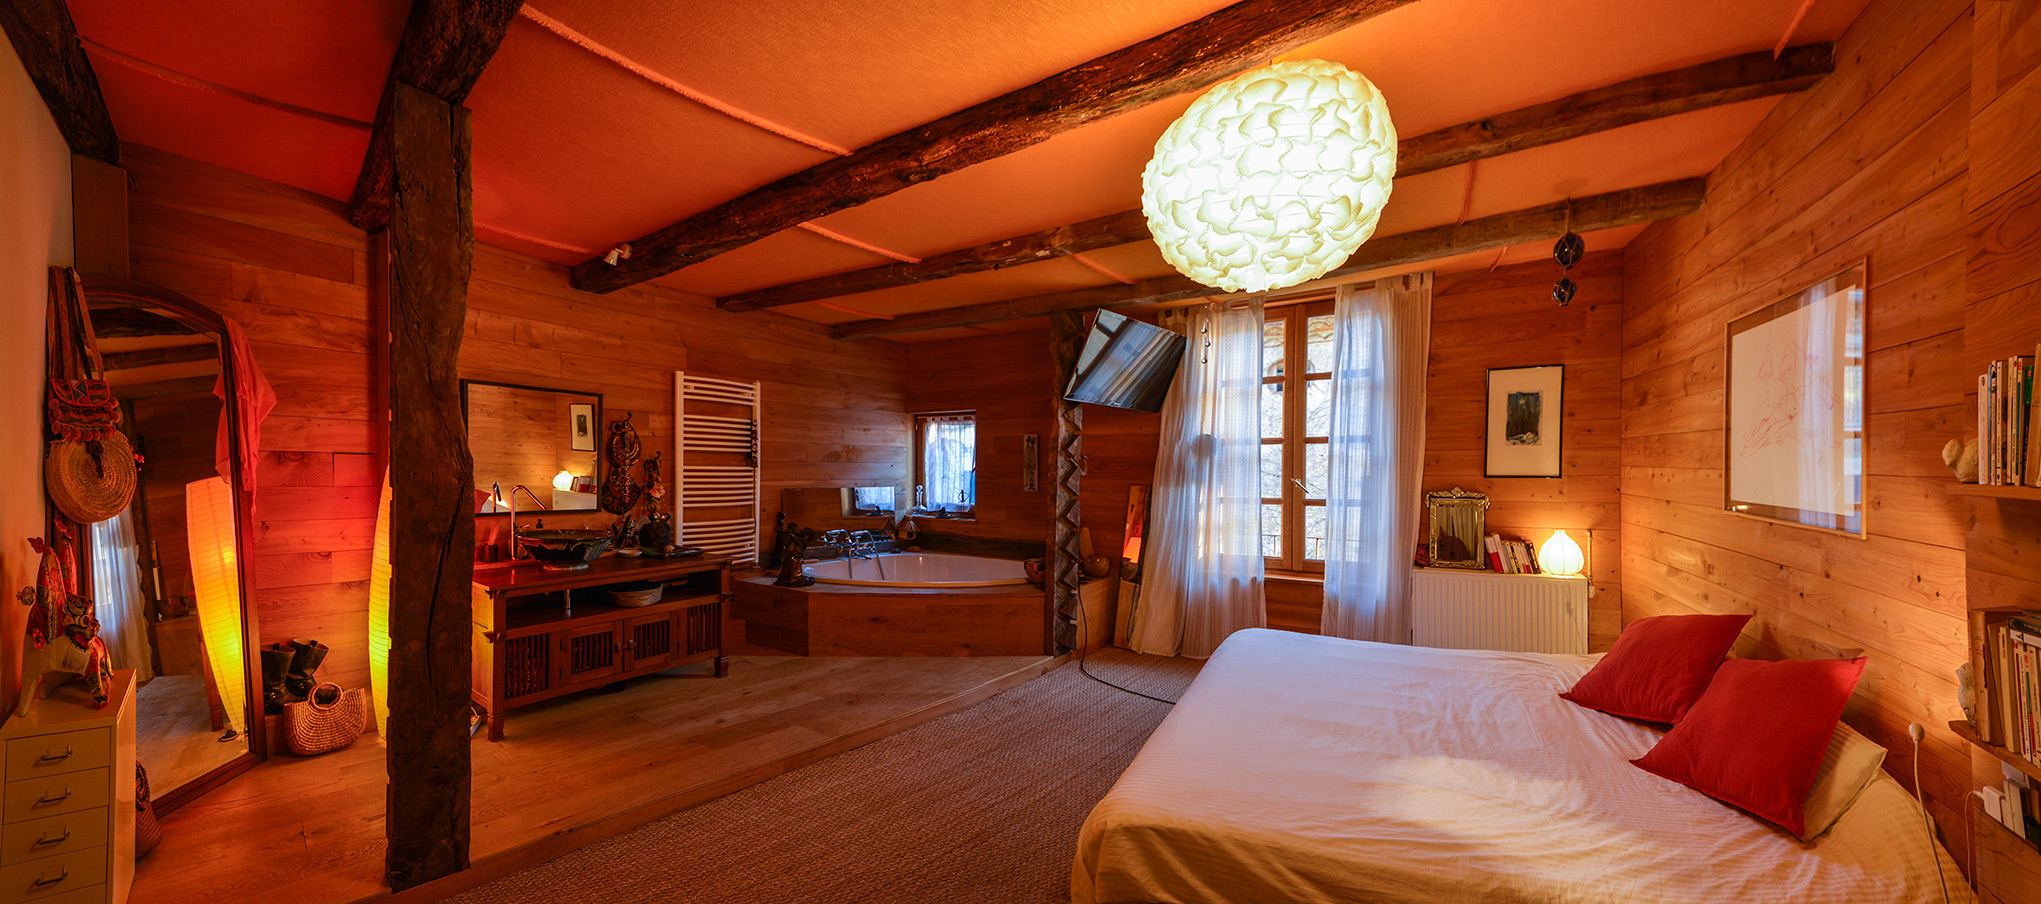 raphael_bedroom_pano.jpg